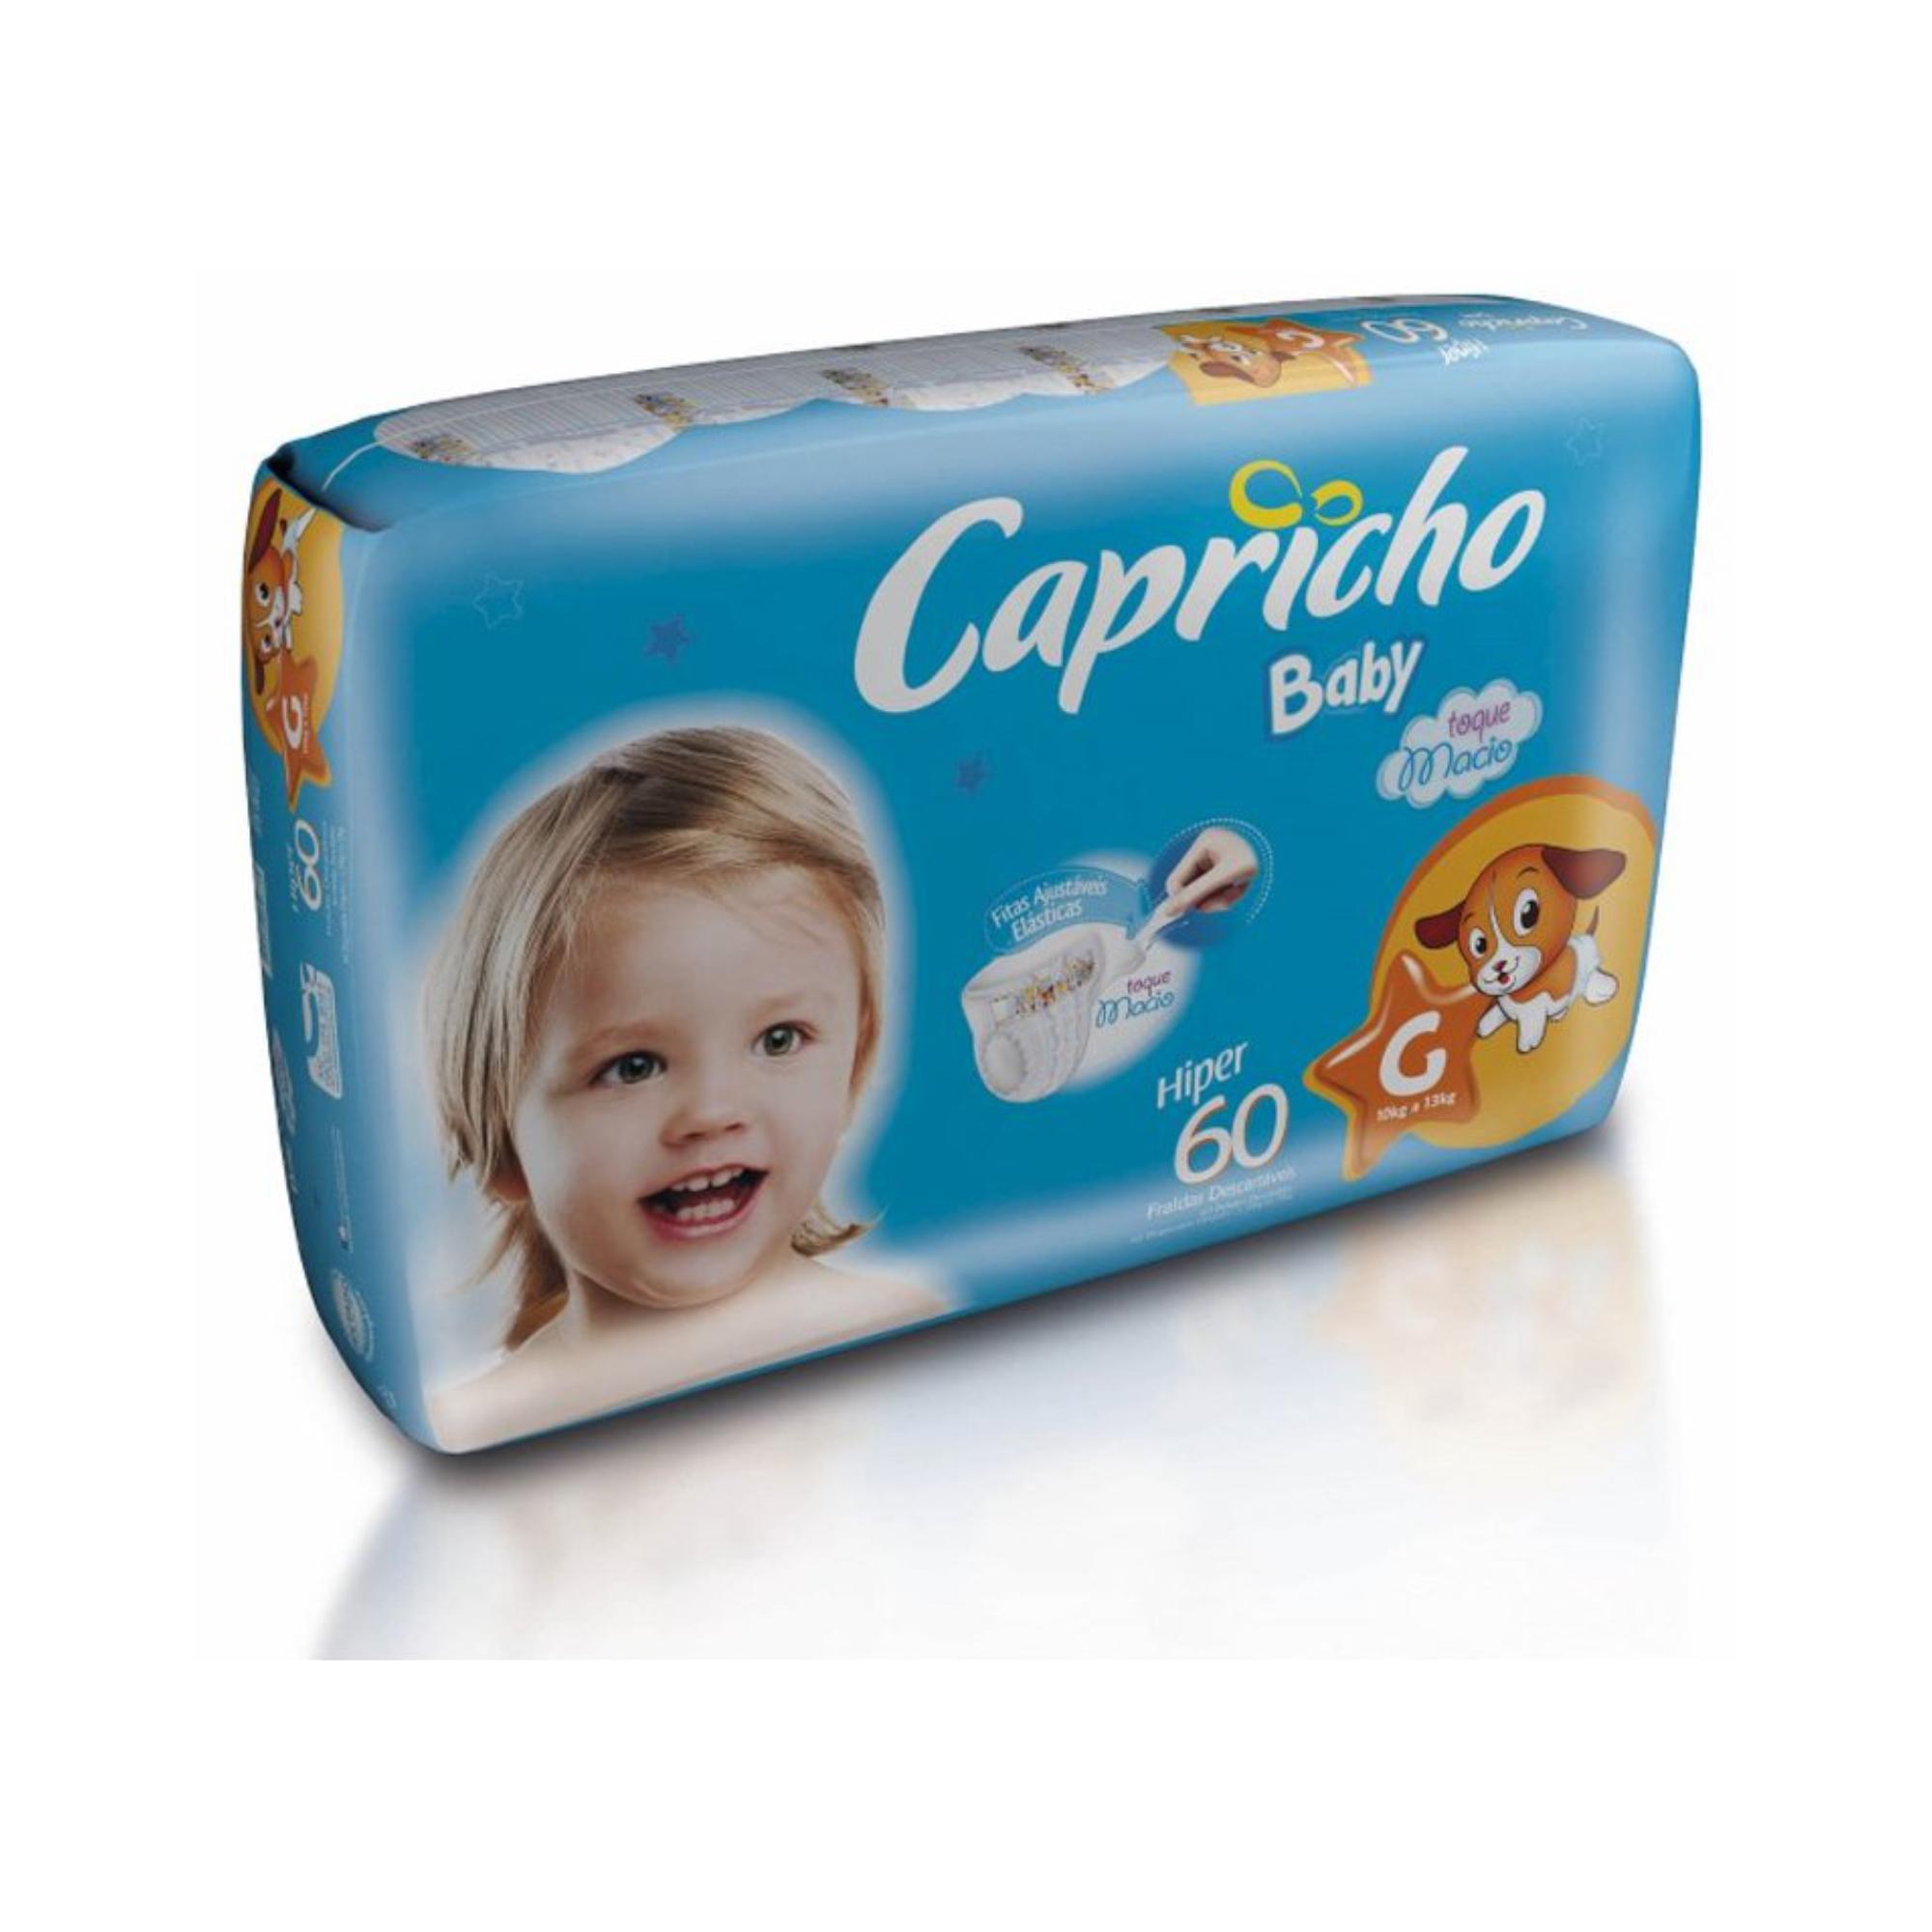 FRALDA CAPRICHO BABY, G 60 FRALDAS PACOTE HIPER